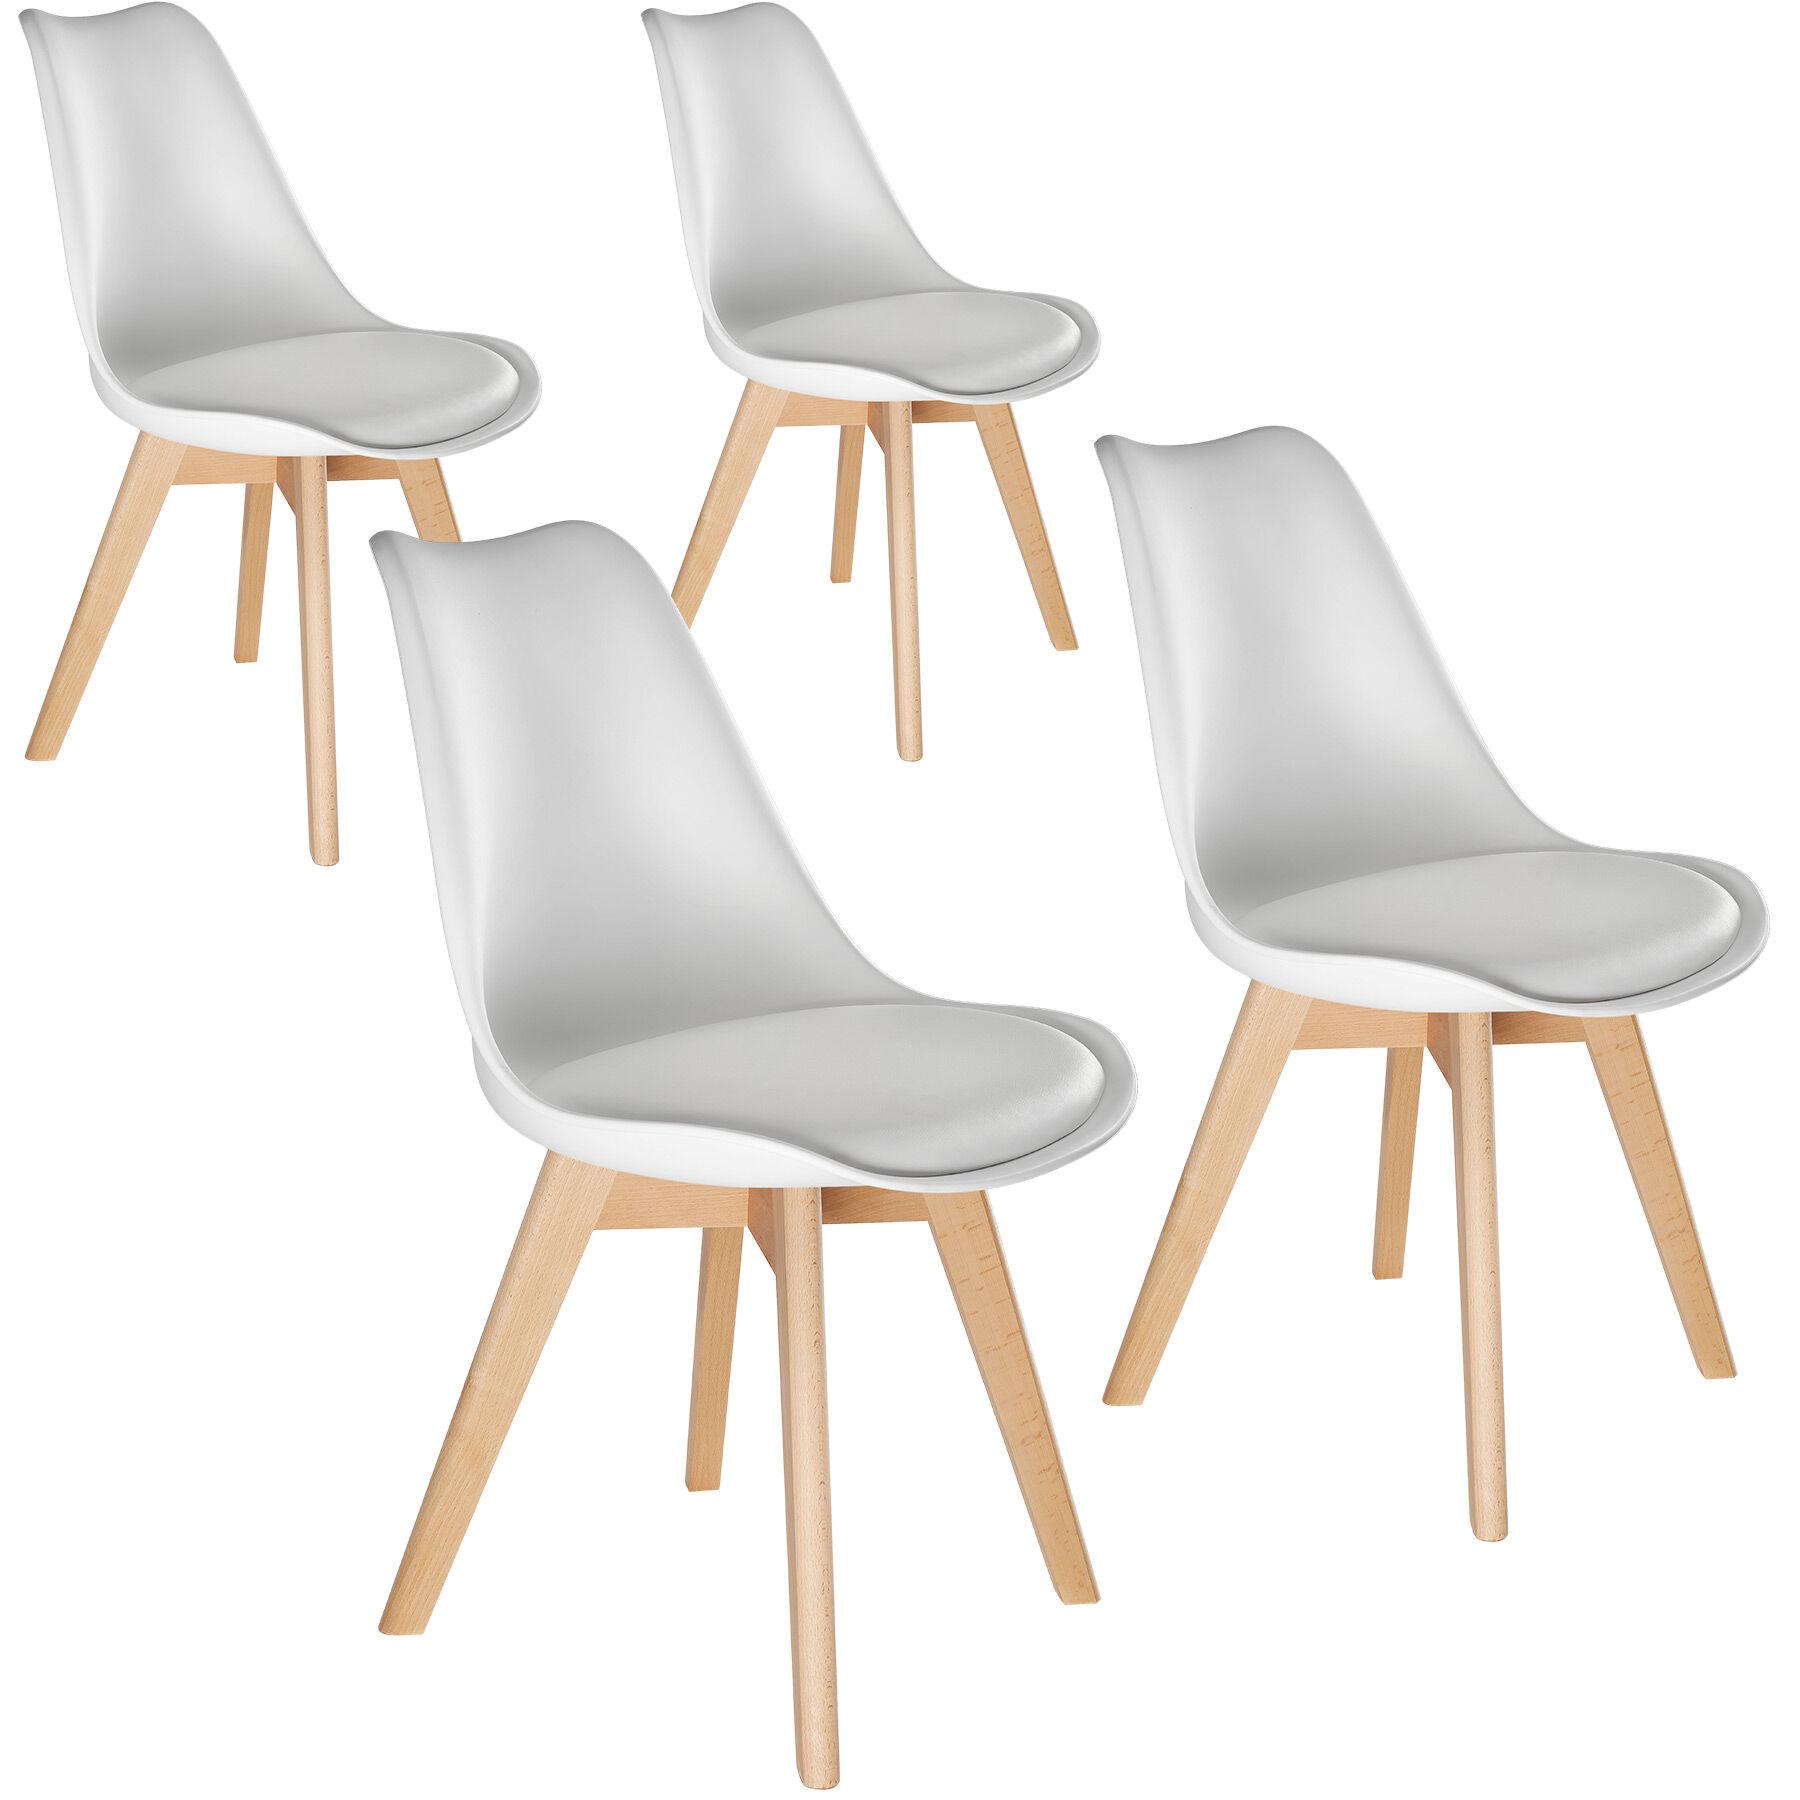 tectake 4 Friederike Dining Chairs - white